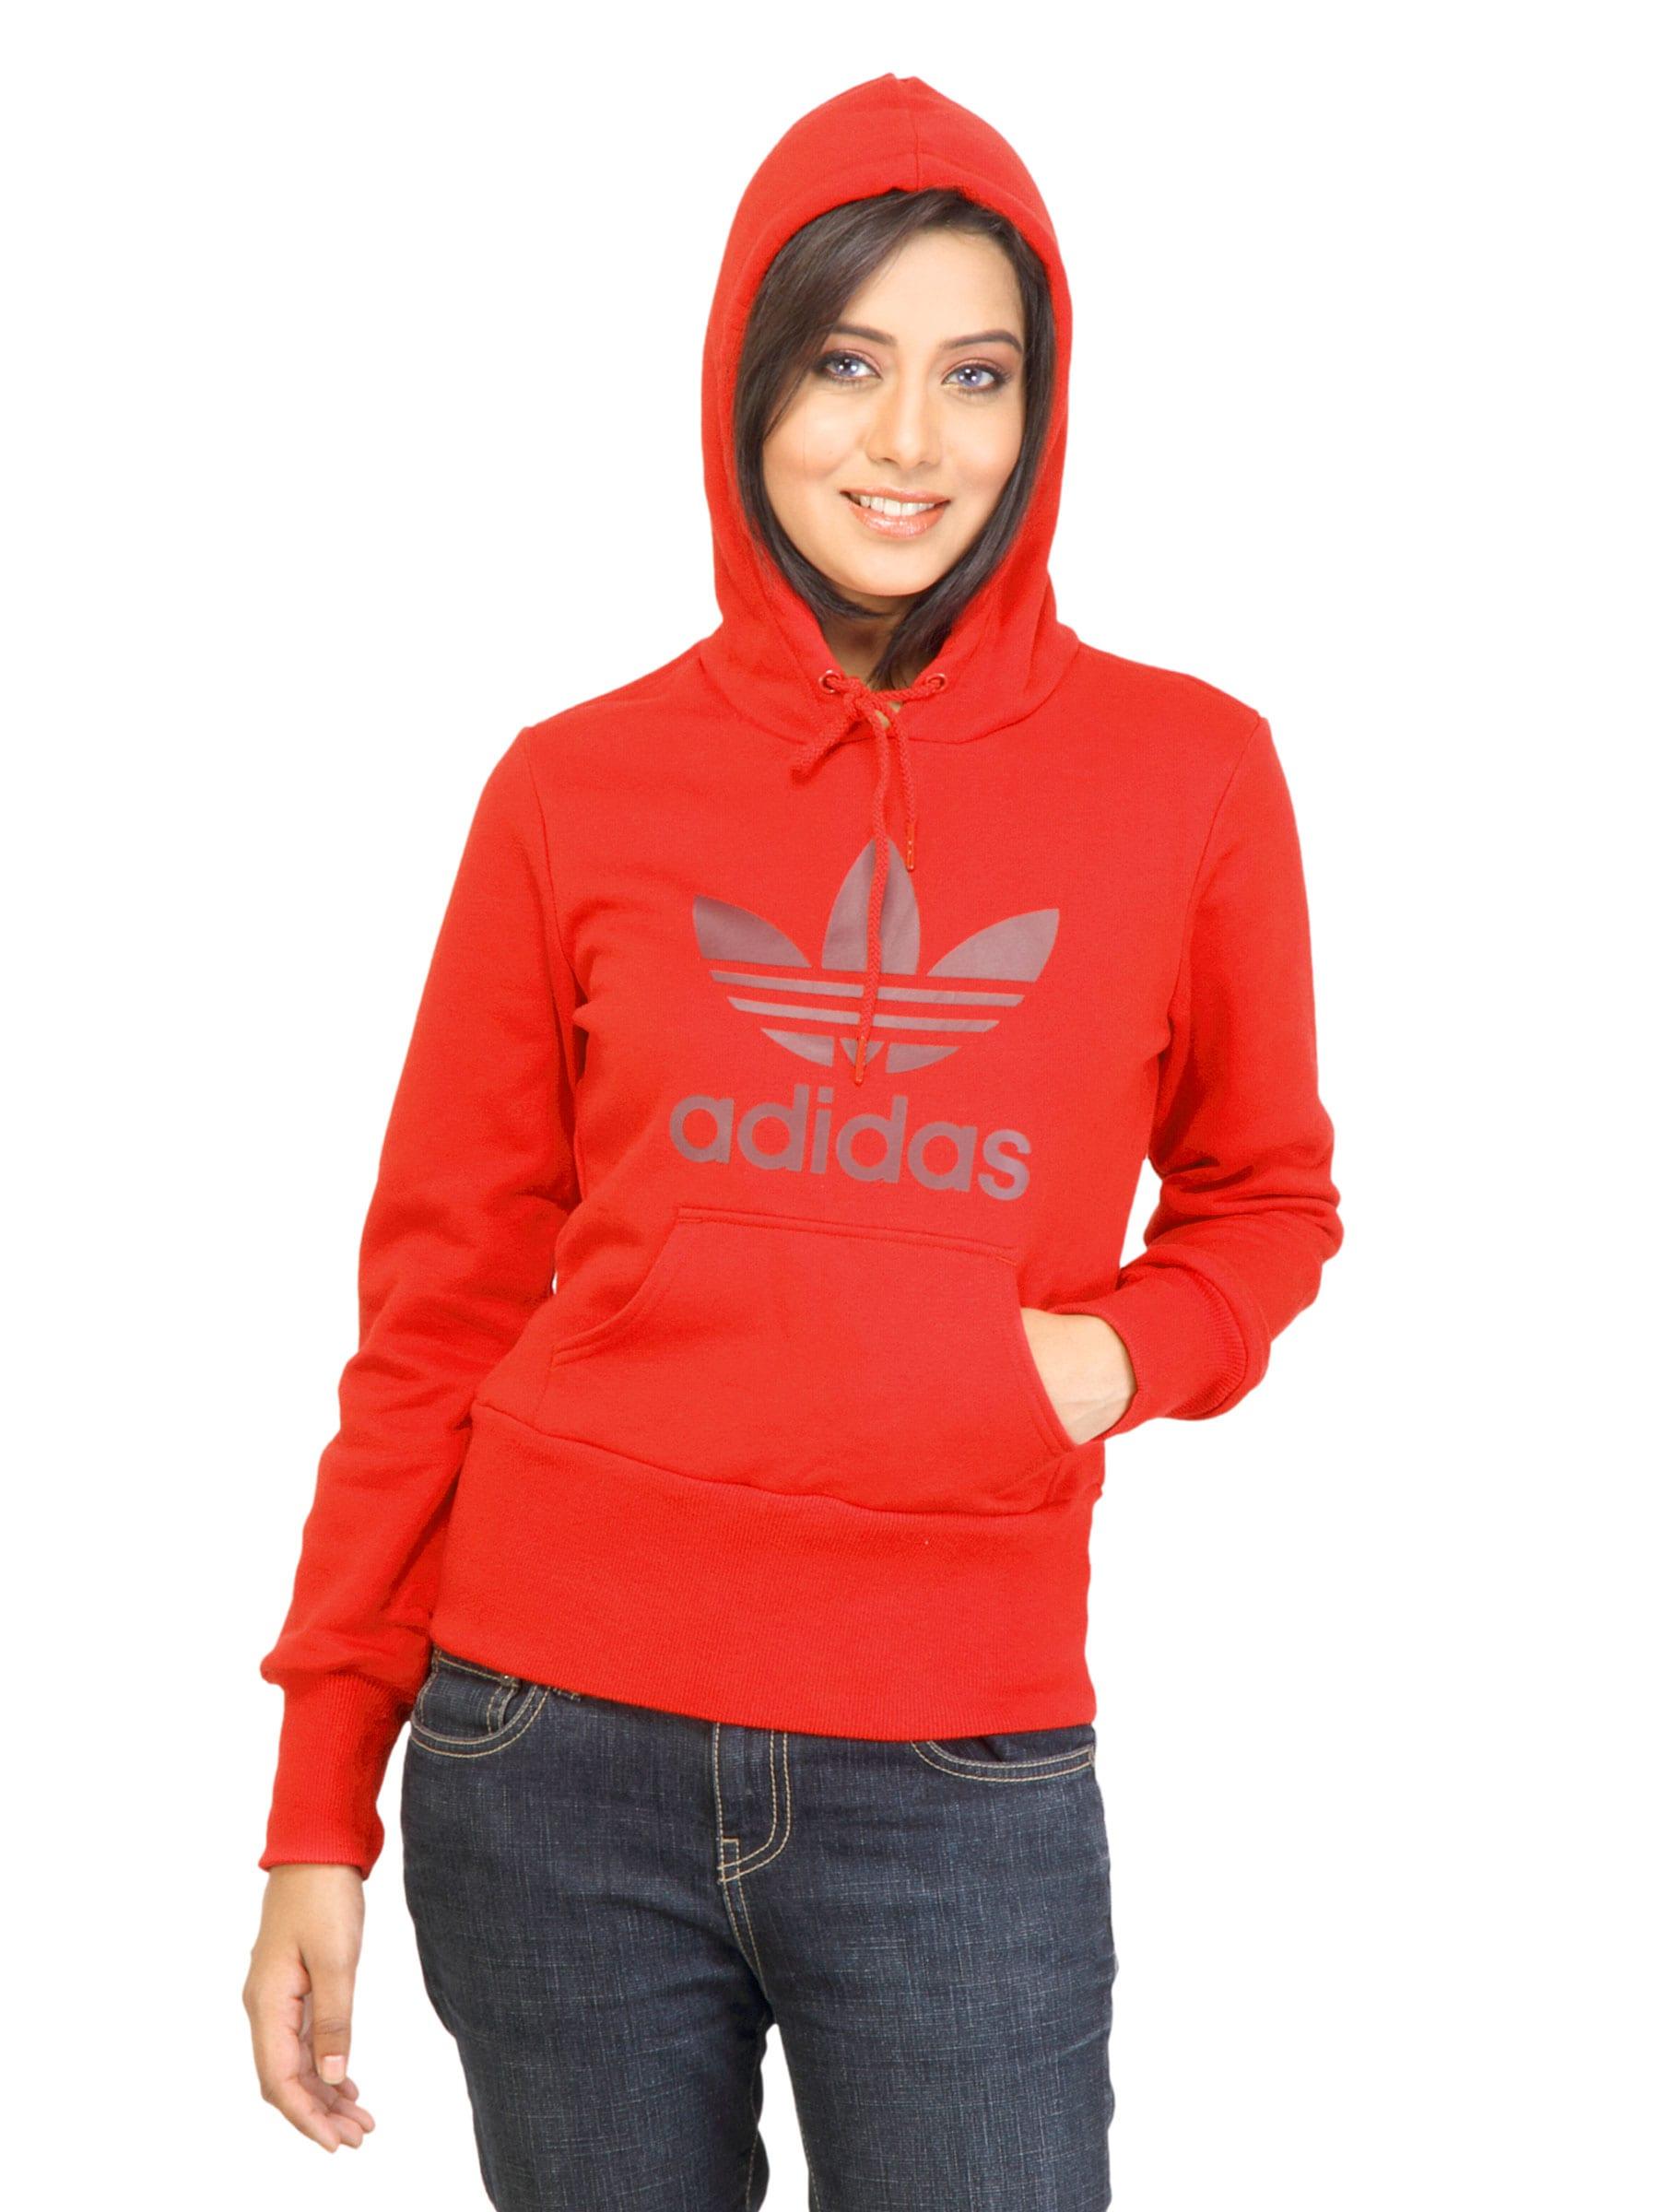 6de76742af0 Adidas o57498 Originals Women Trefoil Hoodie Red Sweatshirt- Price in India